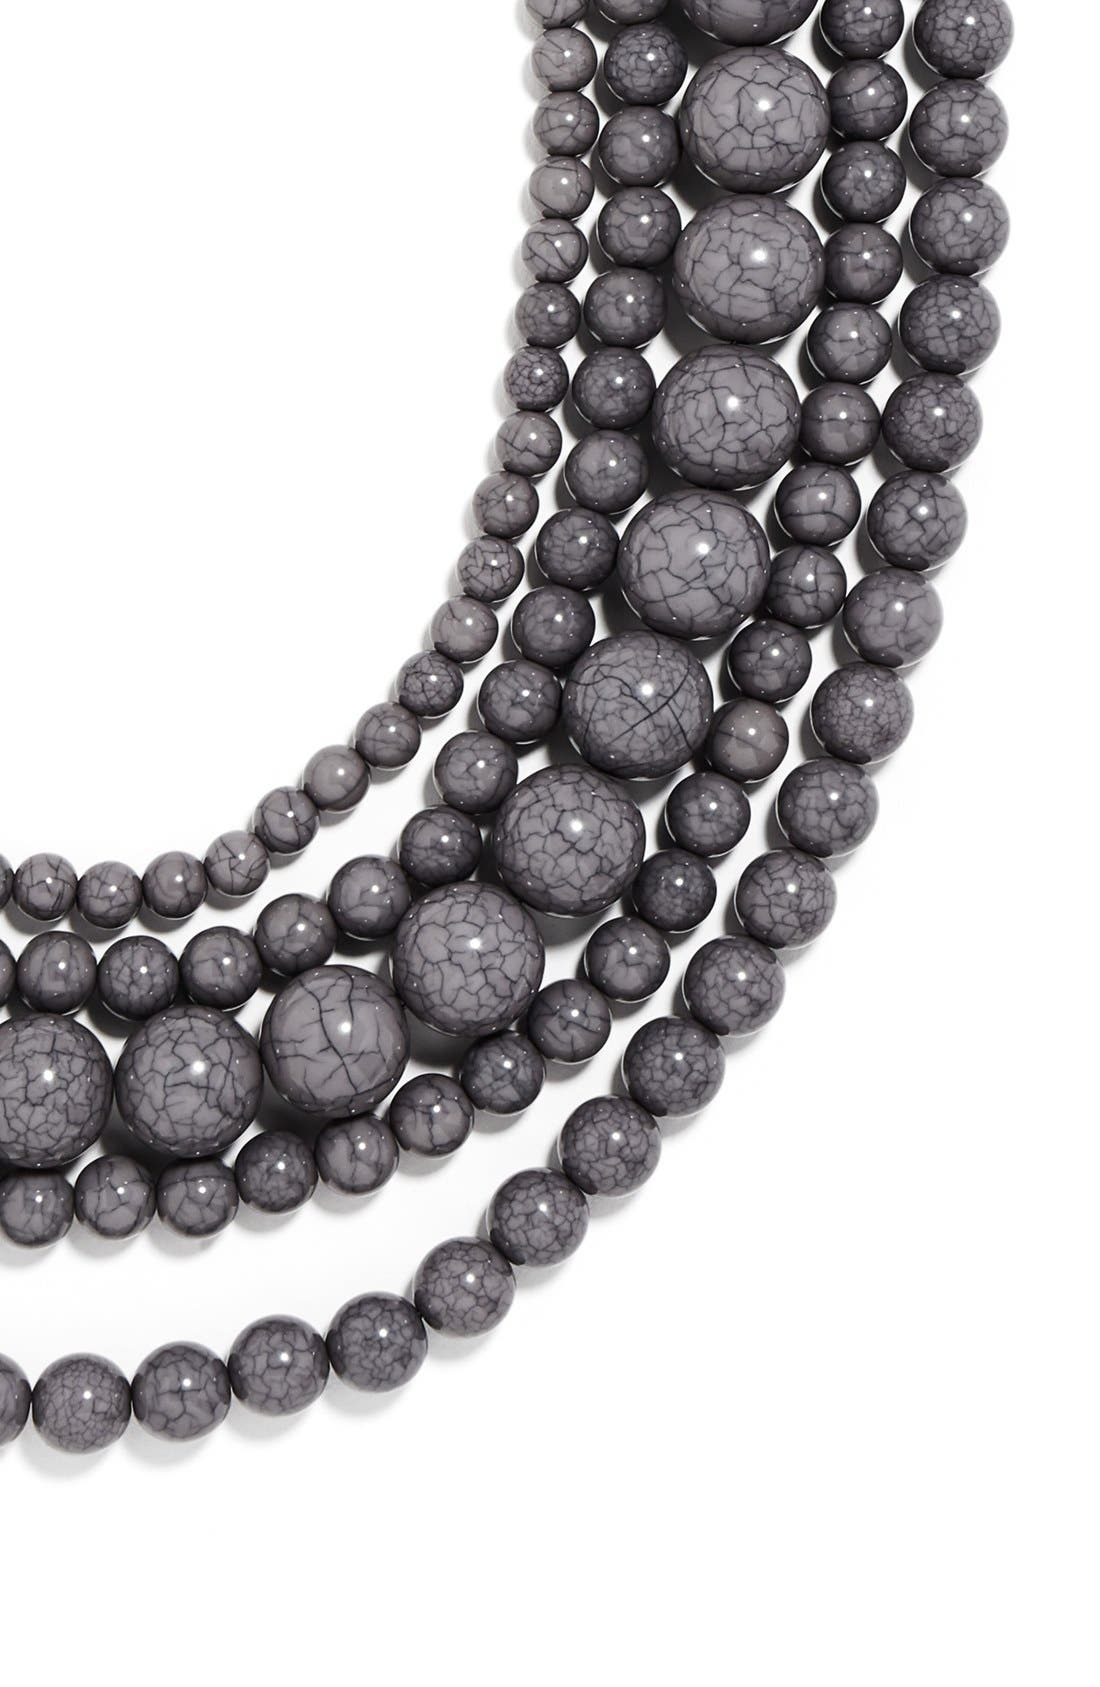 'Globe' Multistrand Beaded Necklace,                             Alternate thumbnail 3, color,                             021